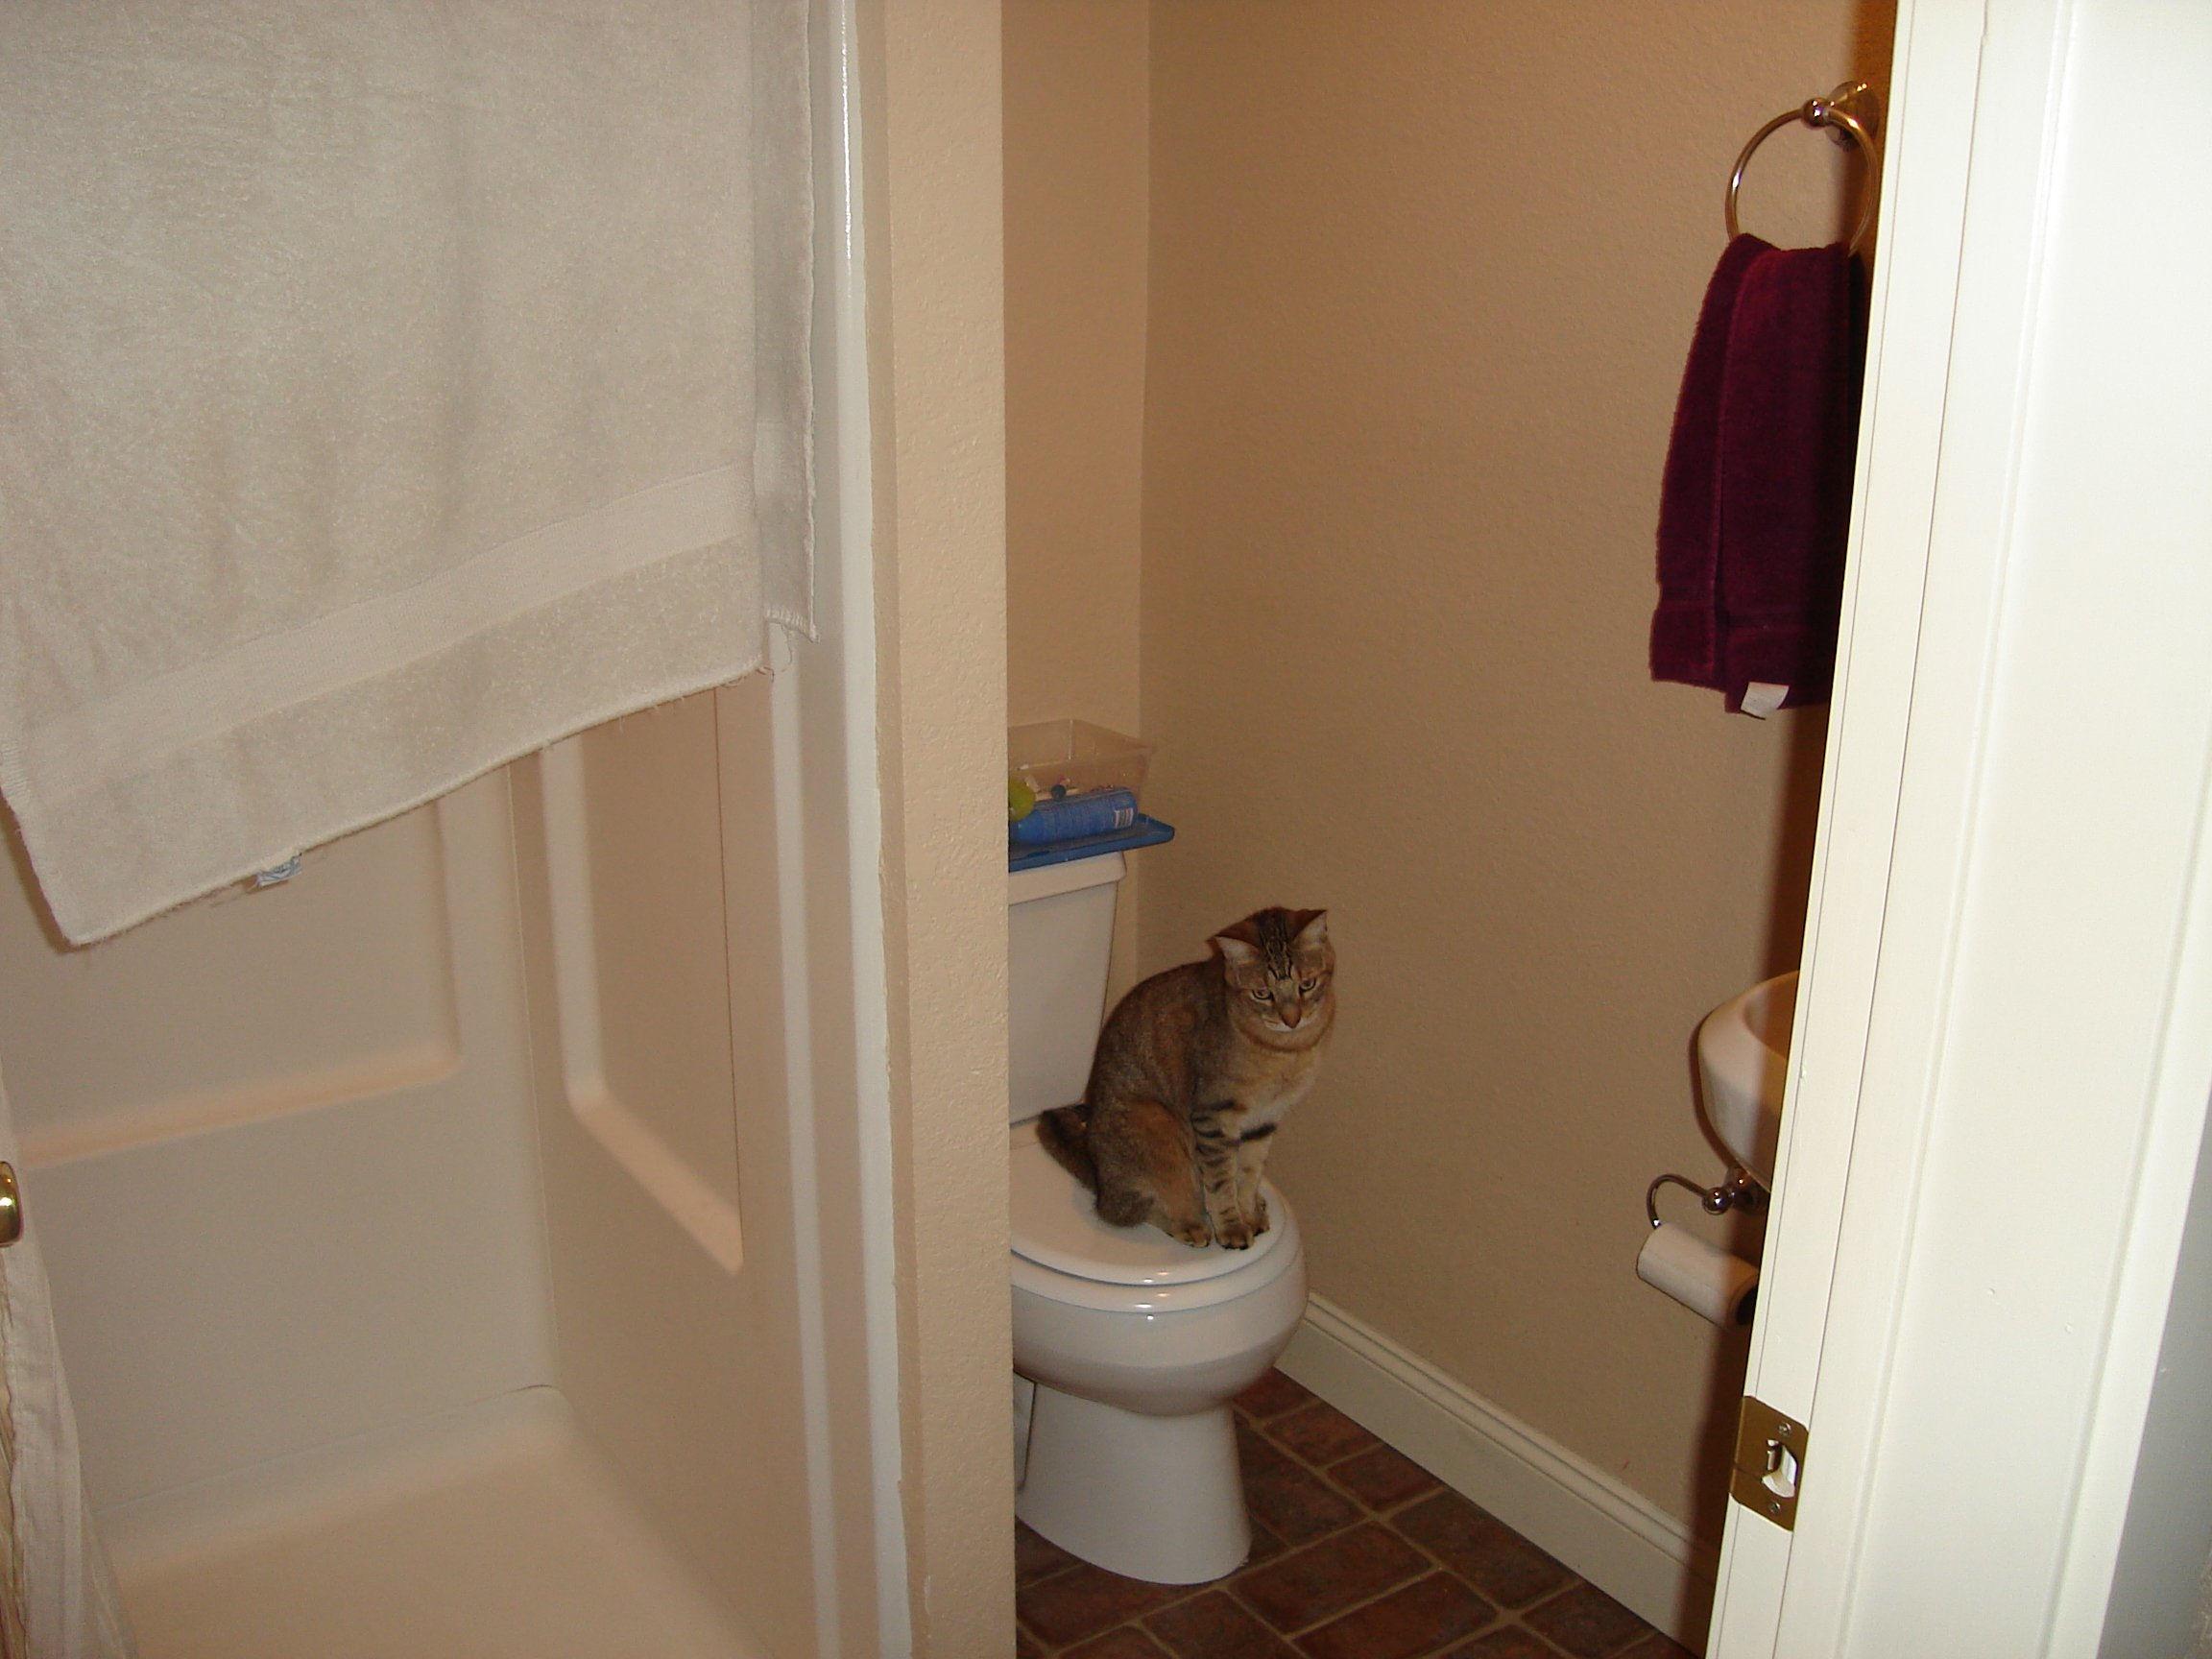 Ajax, the bathroom cat